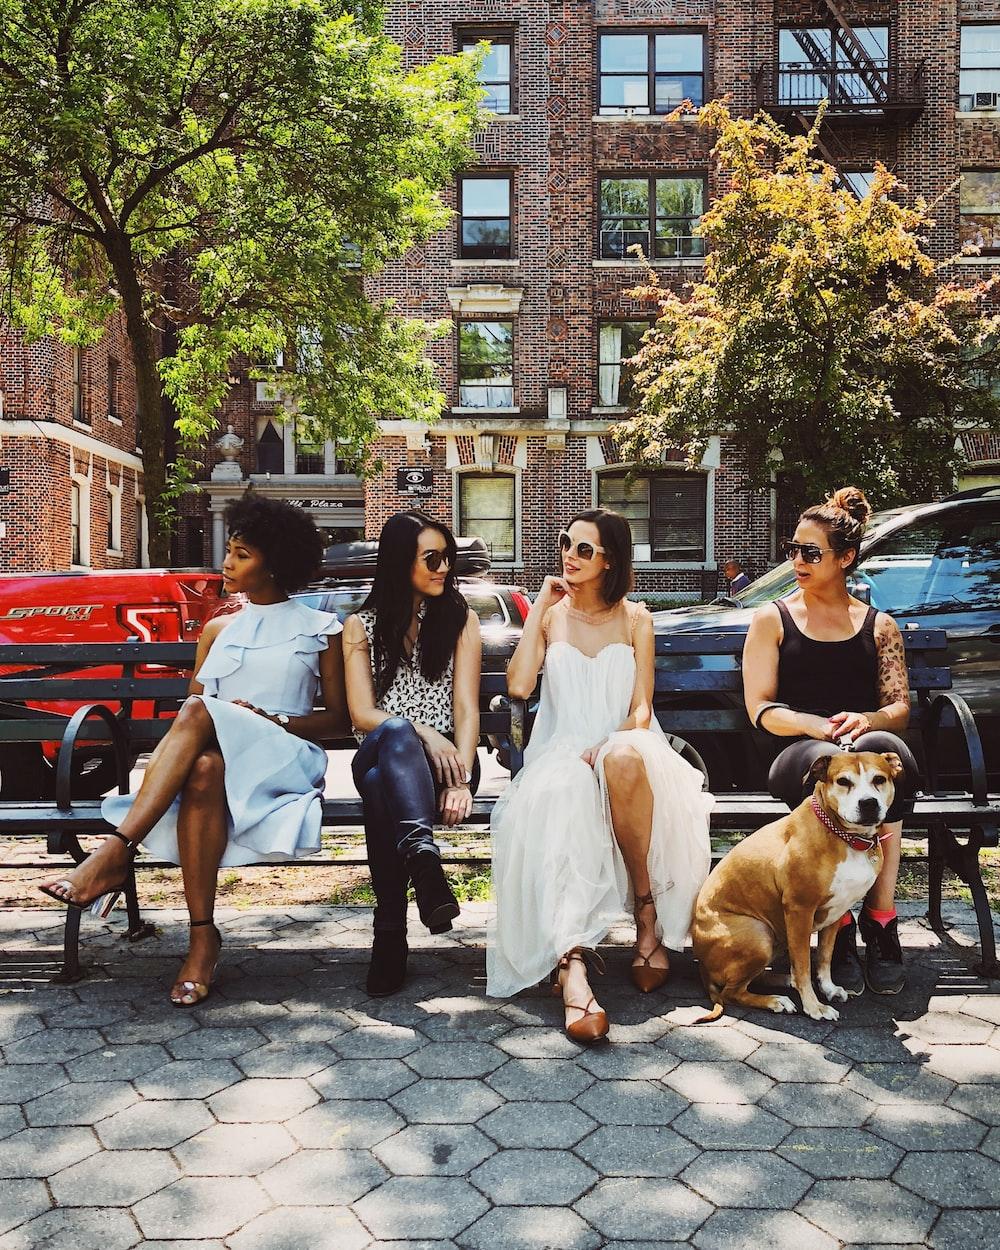 four women sitting on black steel bench during daytime